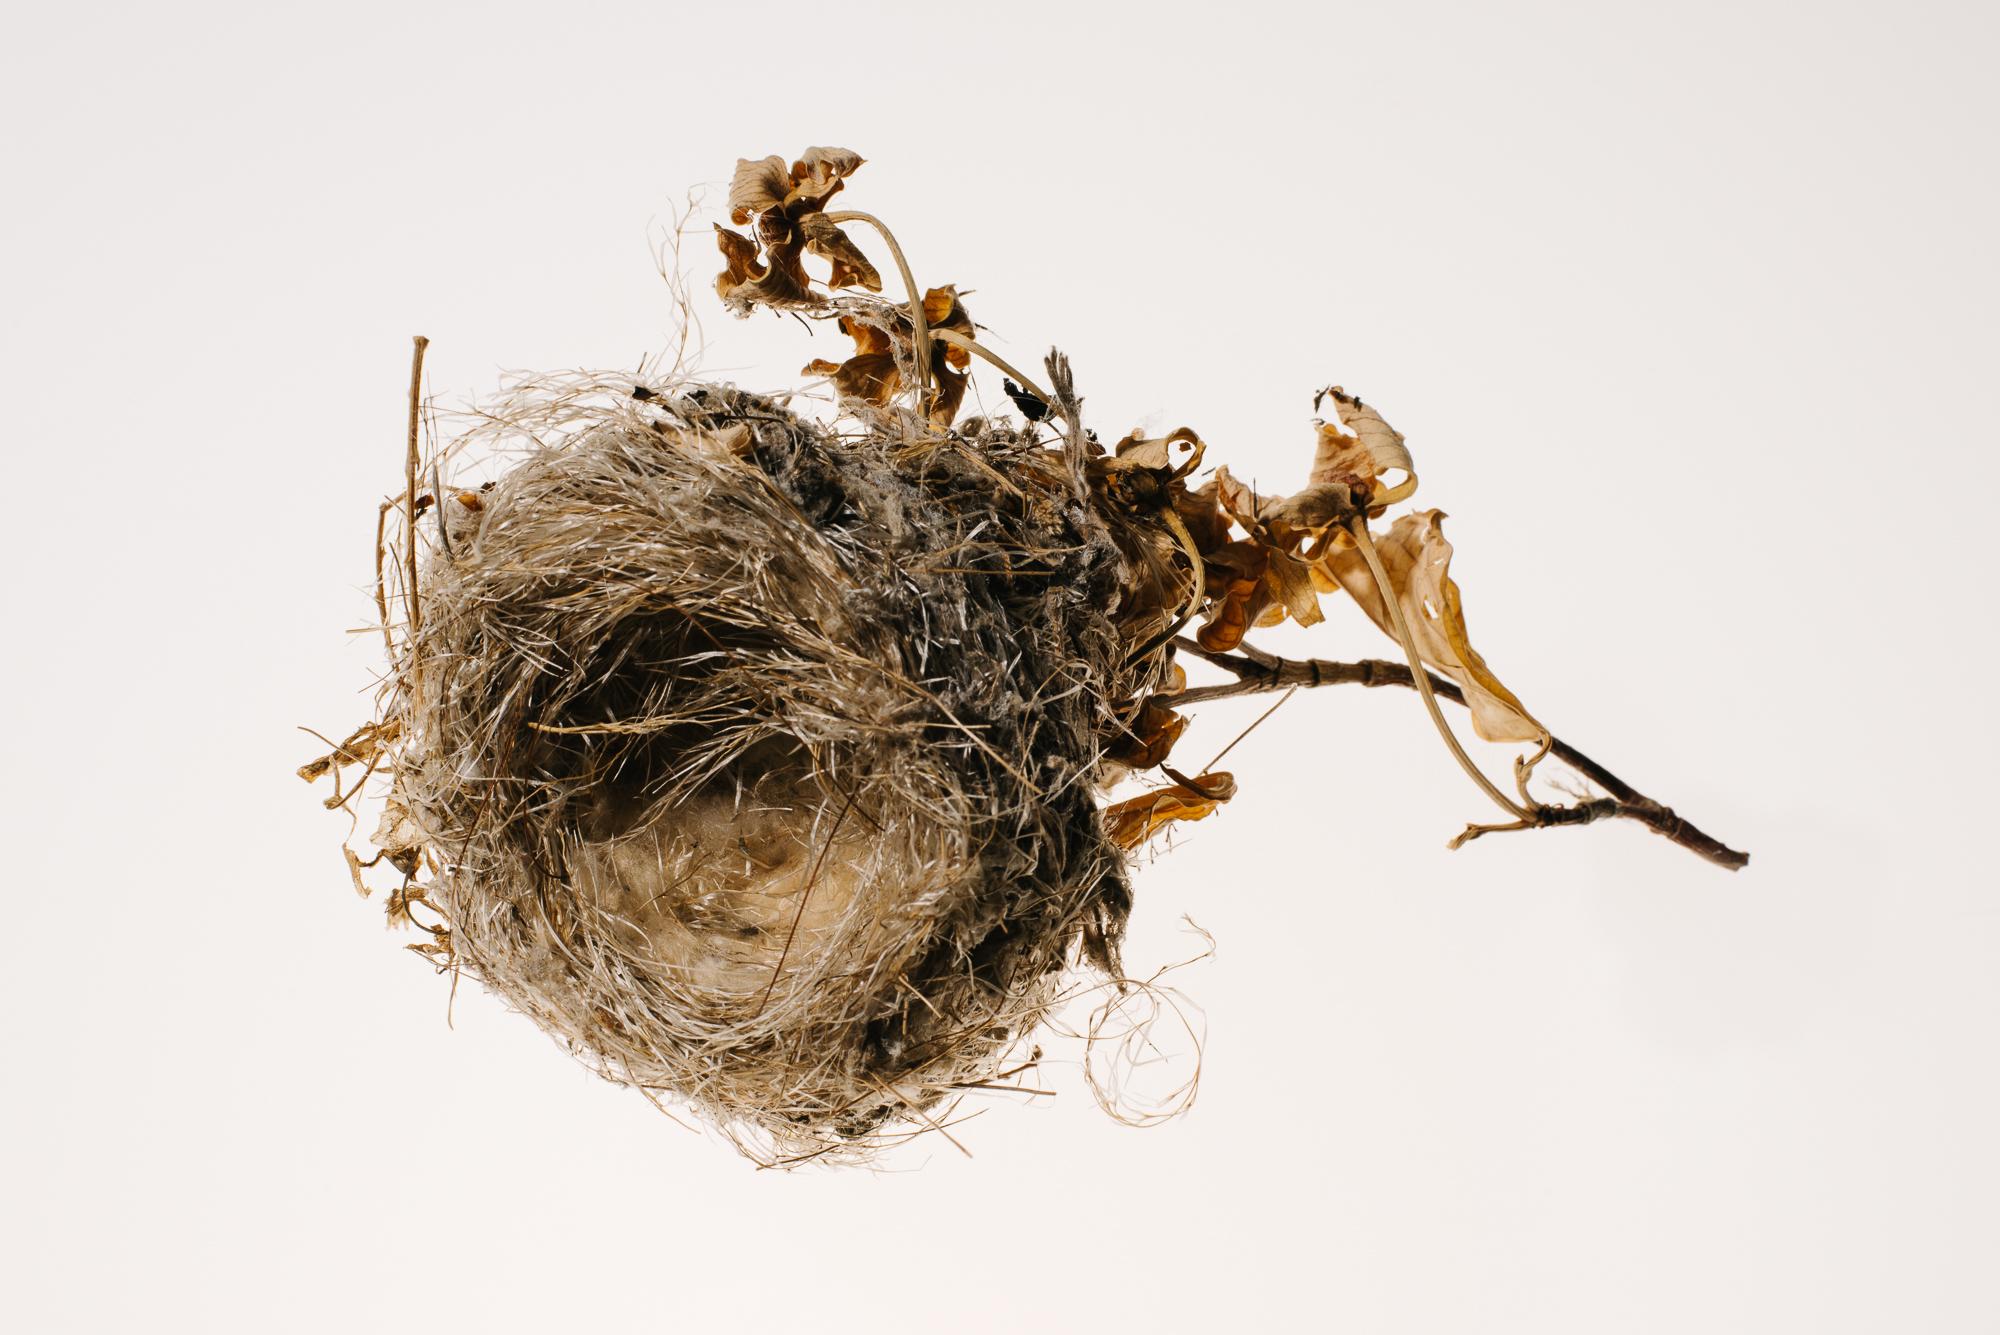 Bird_Nests-0009-7.jpg